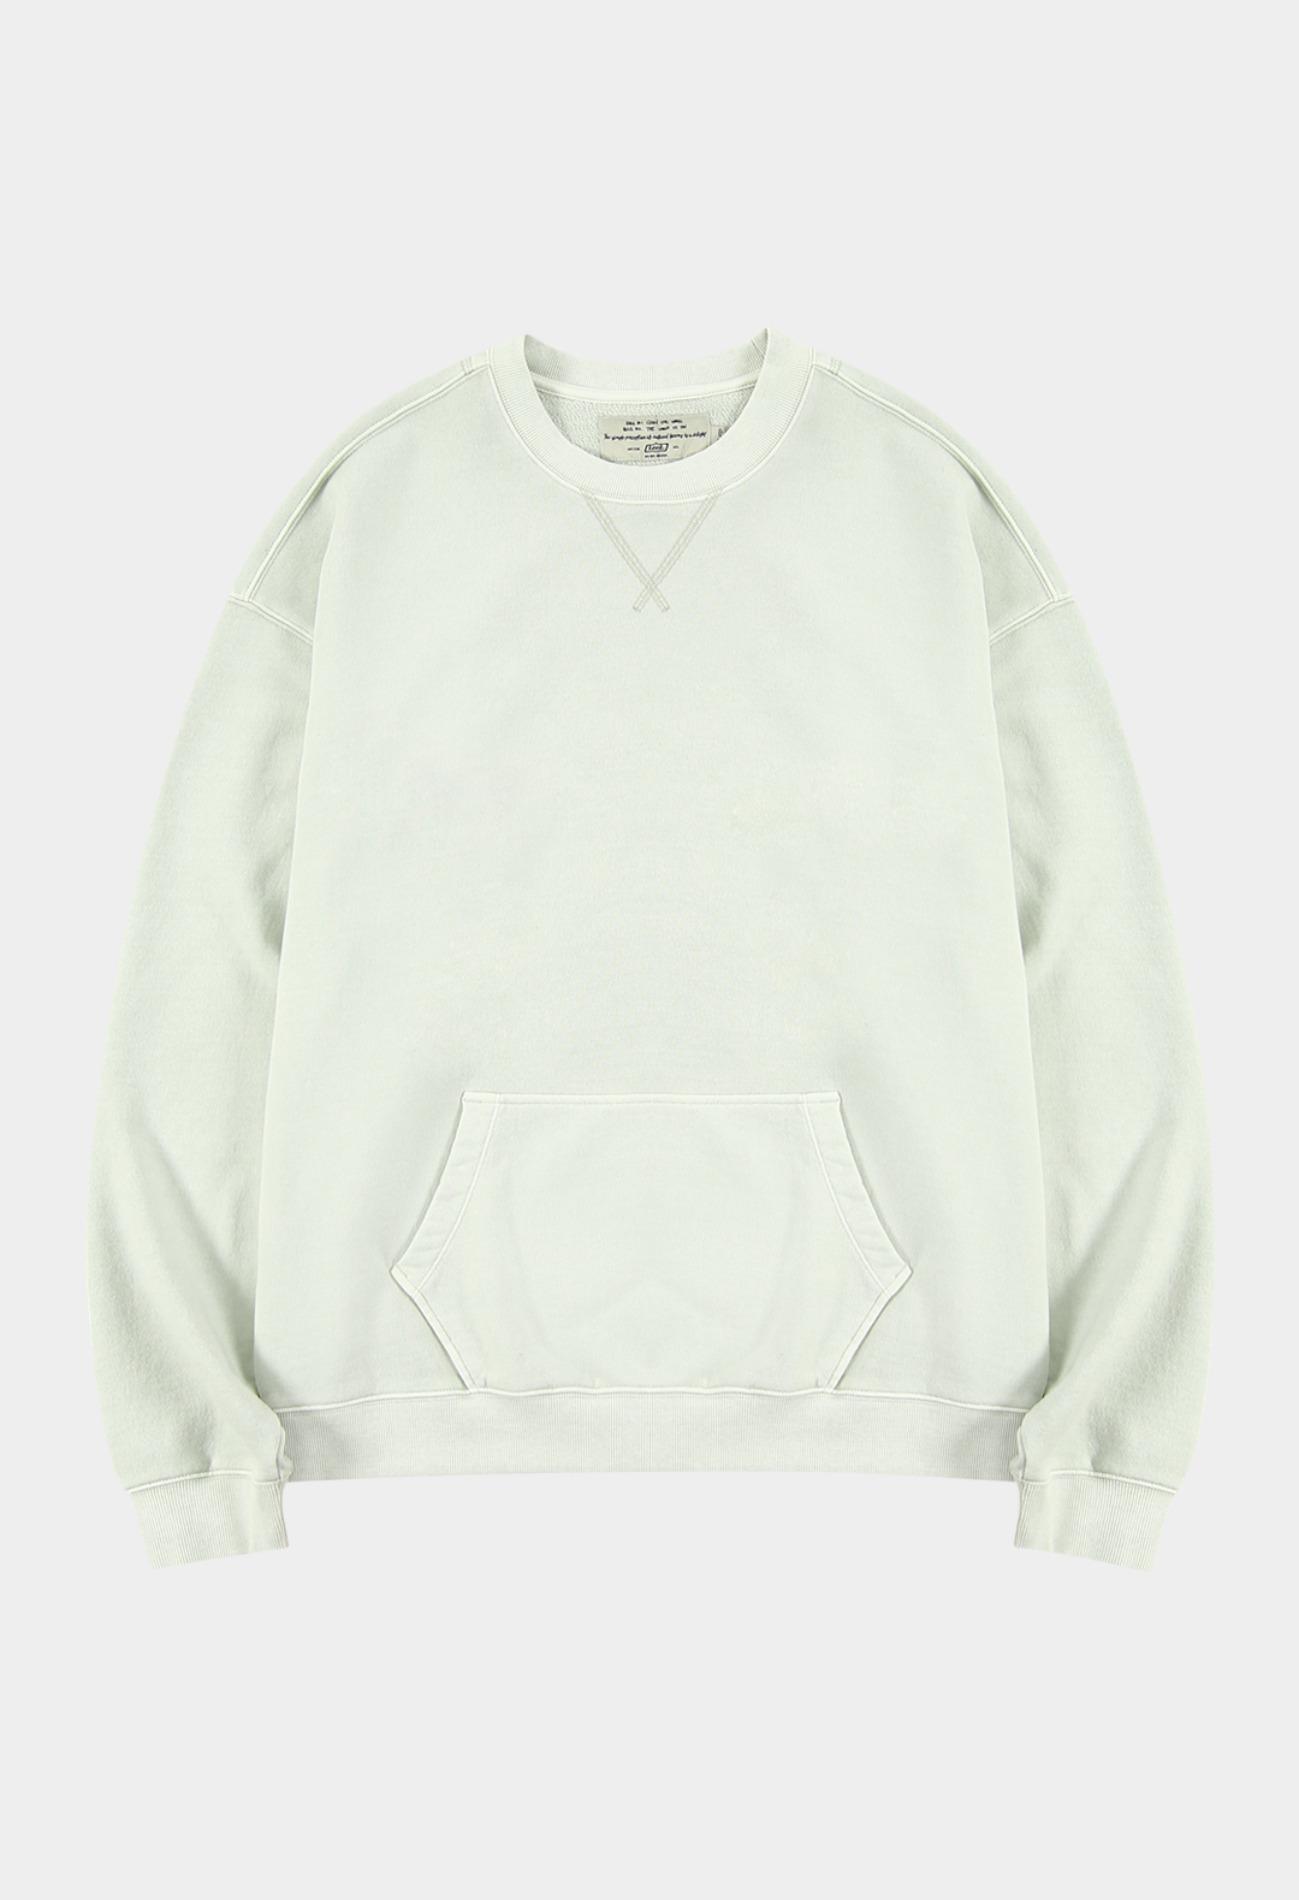 keek Washing pocket sweatshirts - Ivory 스트릿패션 유니섹스브랜드 커플시밀러룩 남자쇼핑몰 여성의류쇼핑몰 후드티 힙색